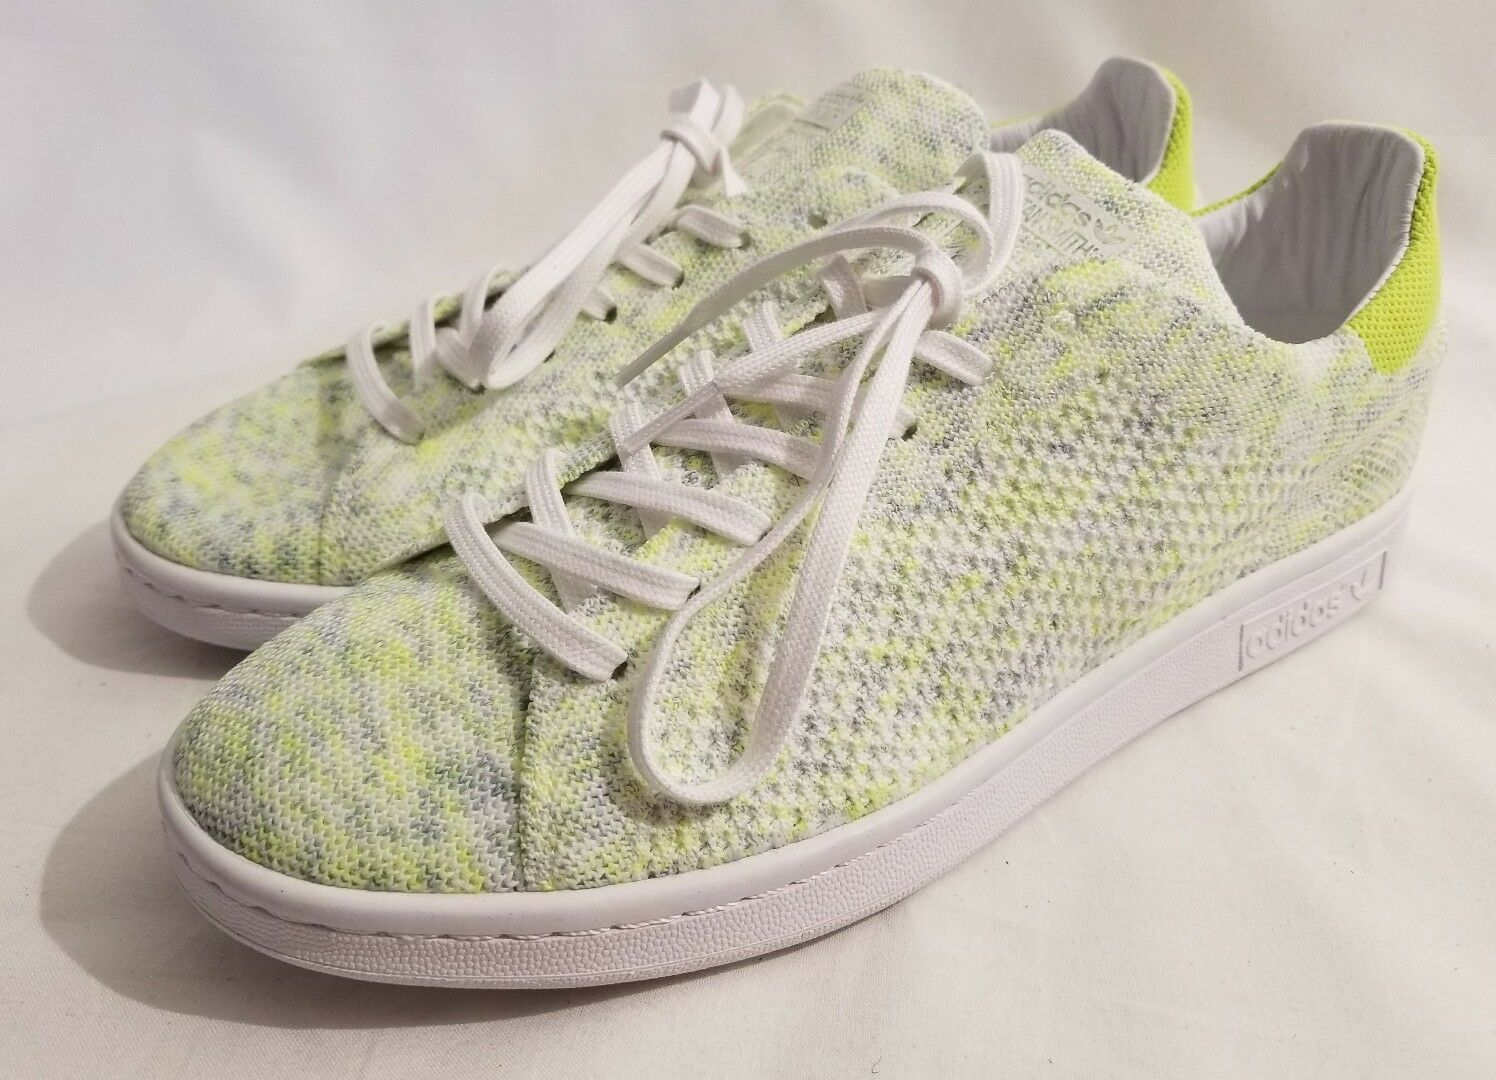 Adidas Originals Stan Smith PrimeKnit White Electricity Rare Size 9.5 BA739 New